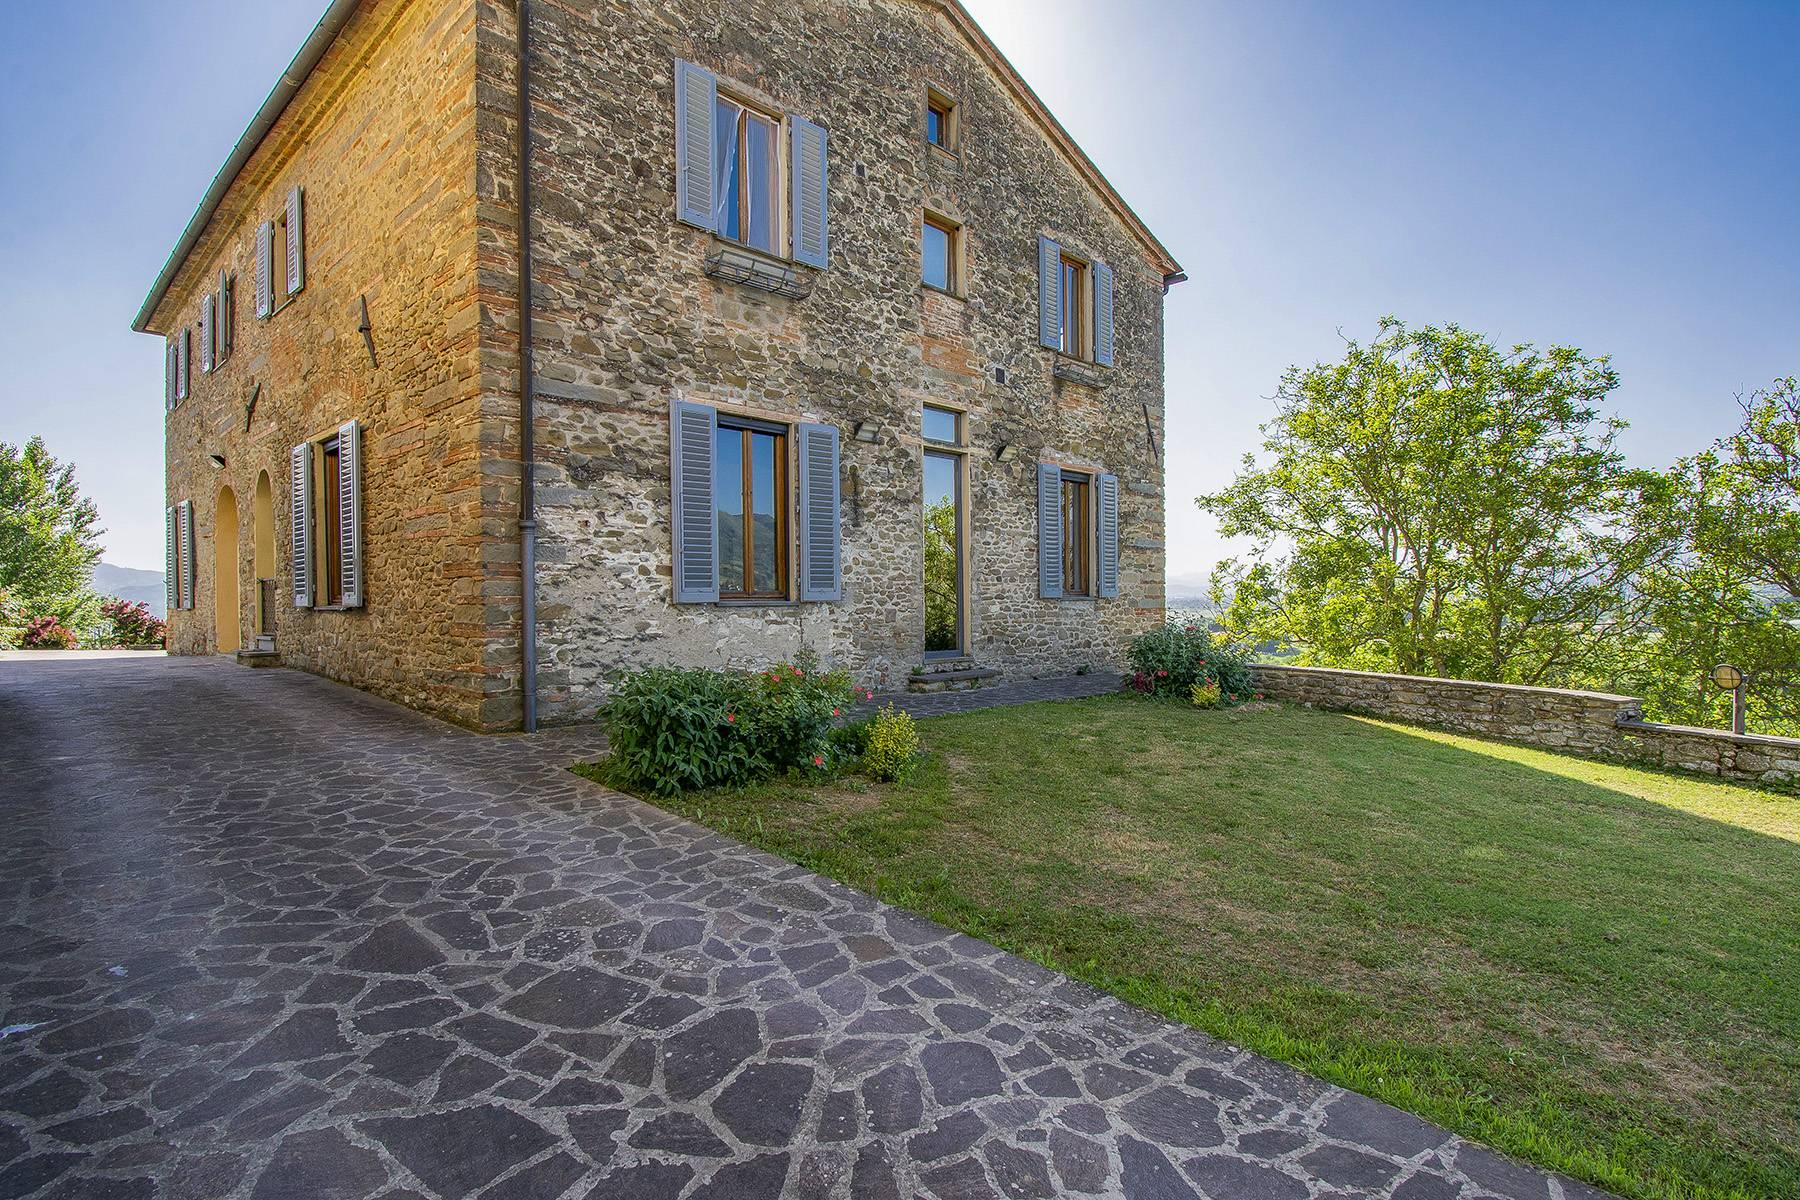 Farmhouse nestled on the Tuscan hills - 3